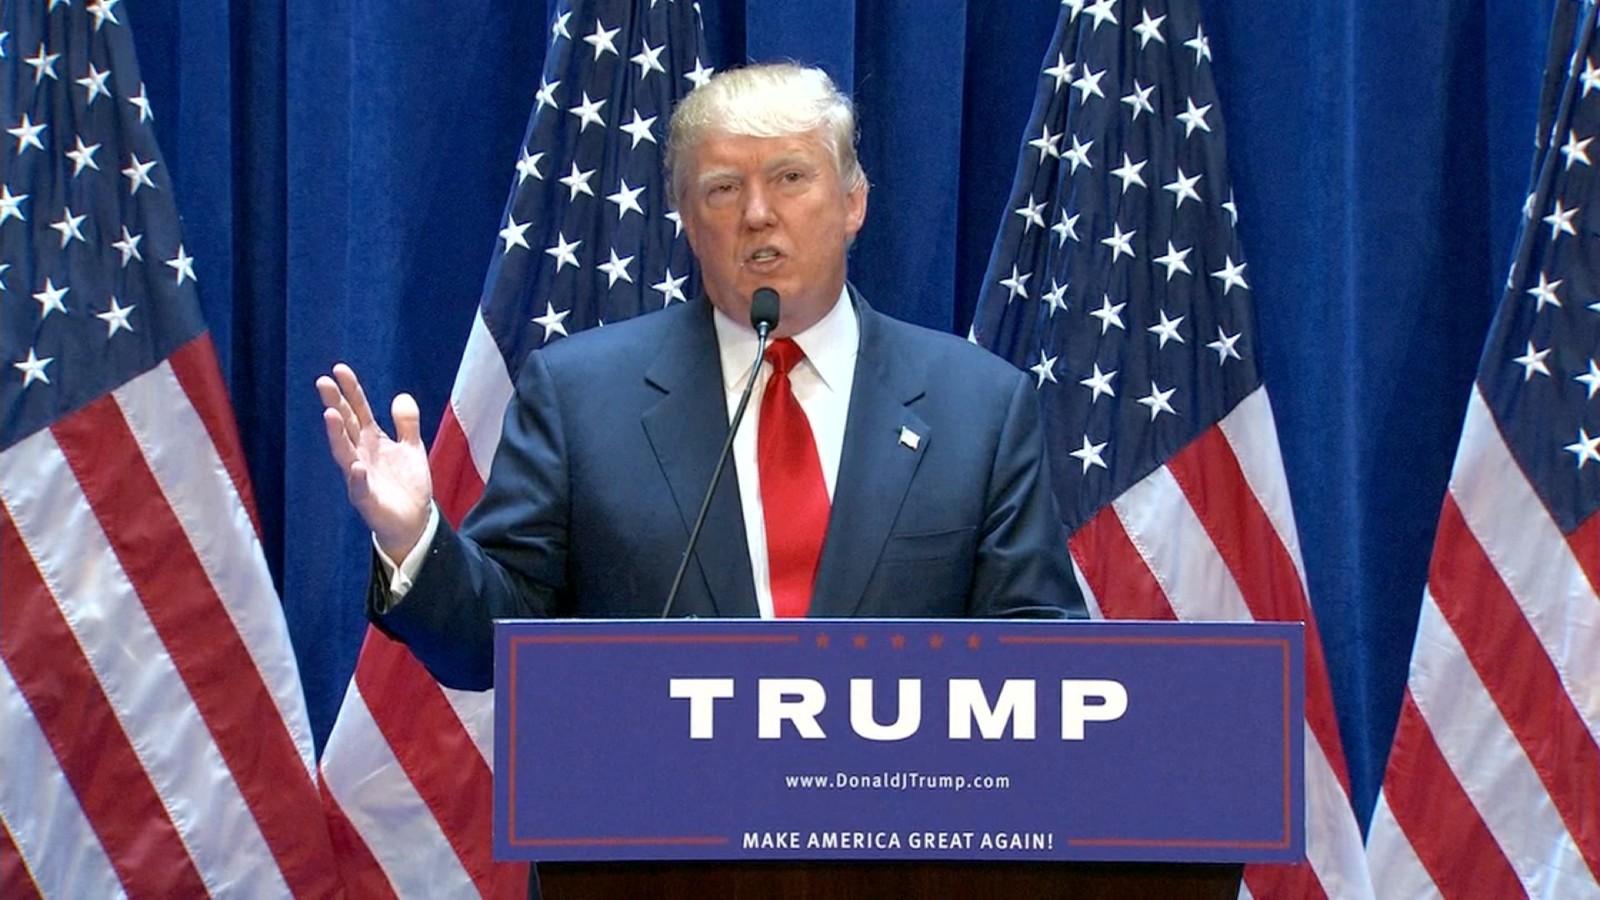 Donald Trump doubles down on calling Mexicans 'rapists'